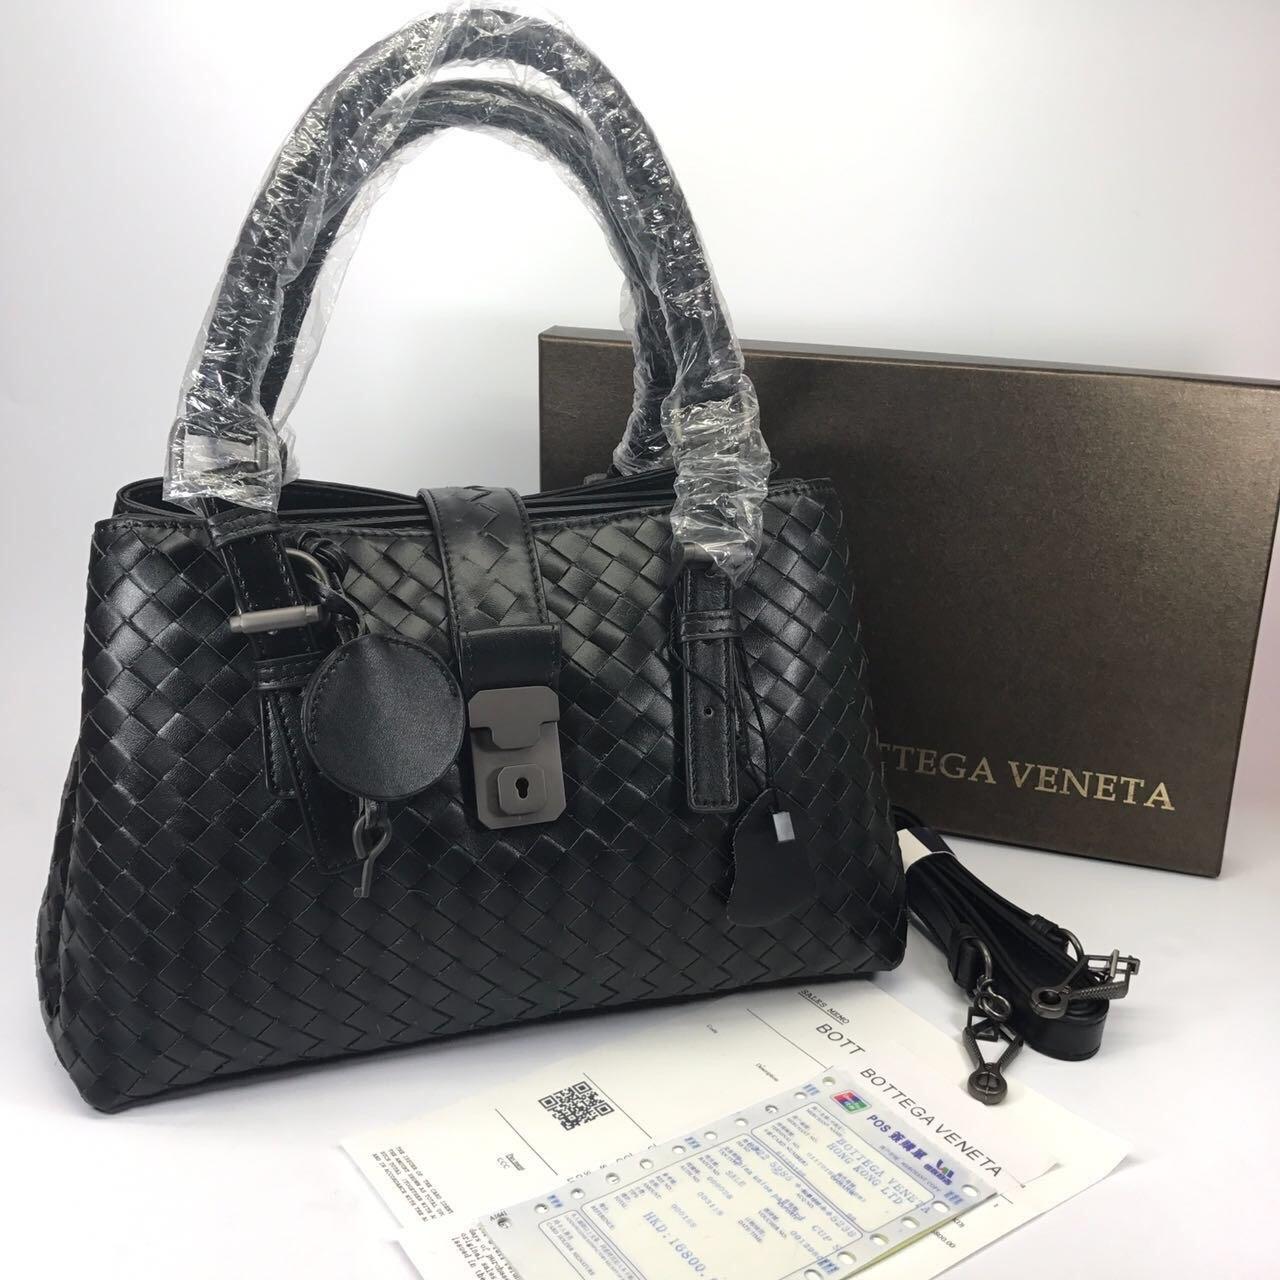 Сумки Bottega Veneta Боттега Венета купить на